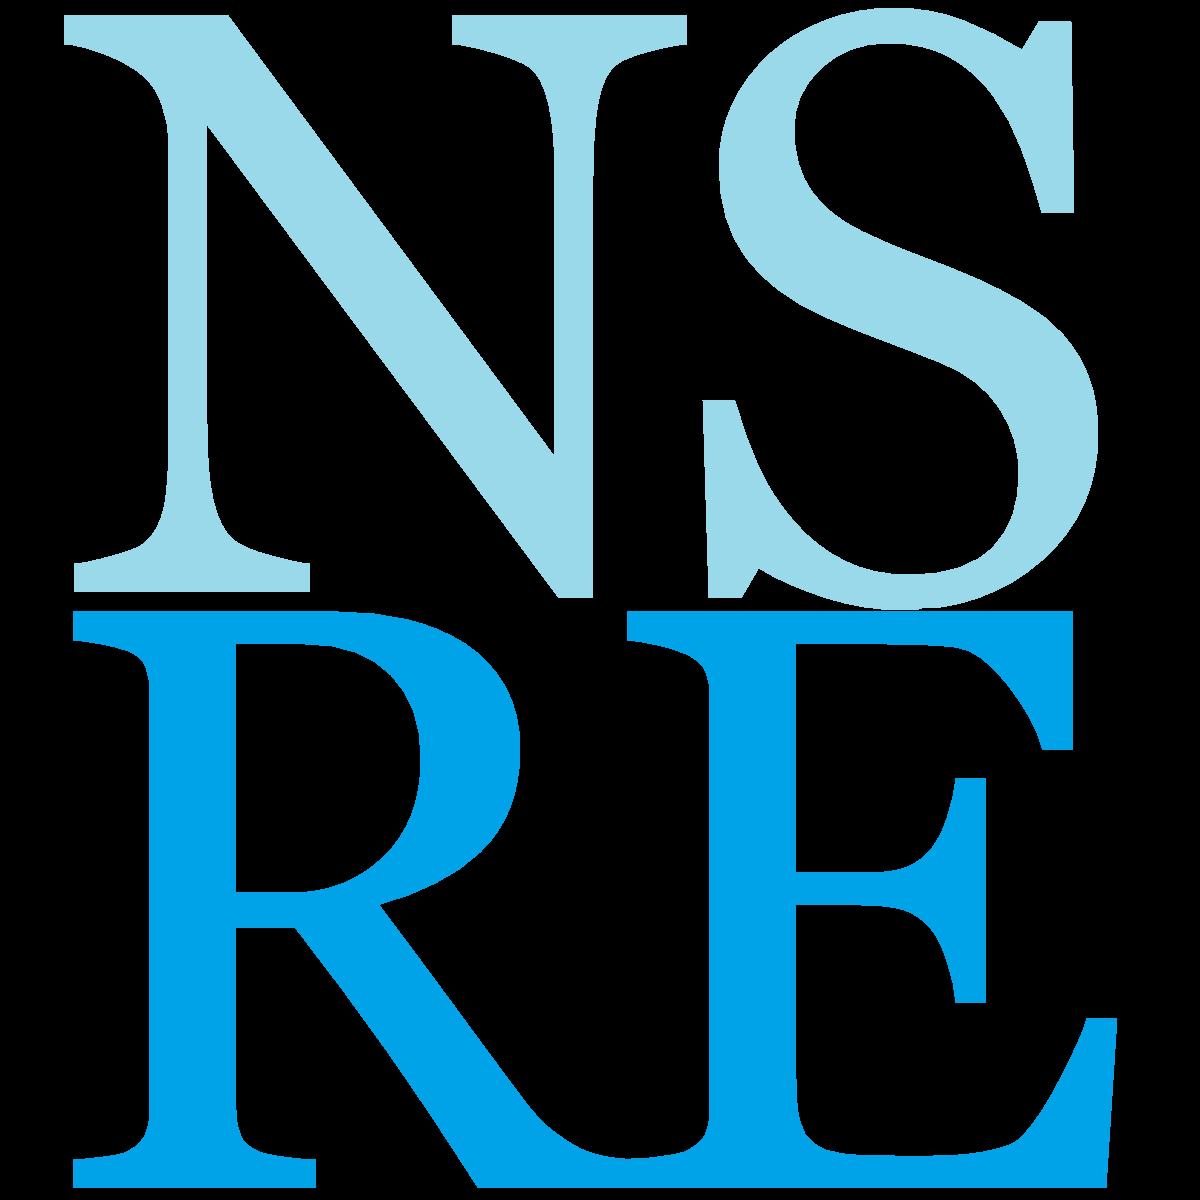 NSRE = Nana Smith Real Estate / Broker, Appraiser & Consultant